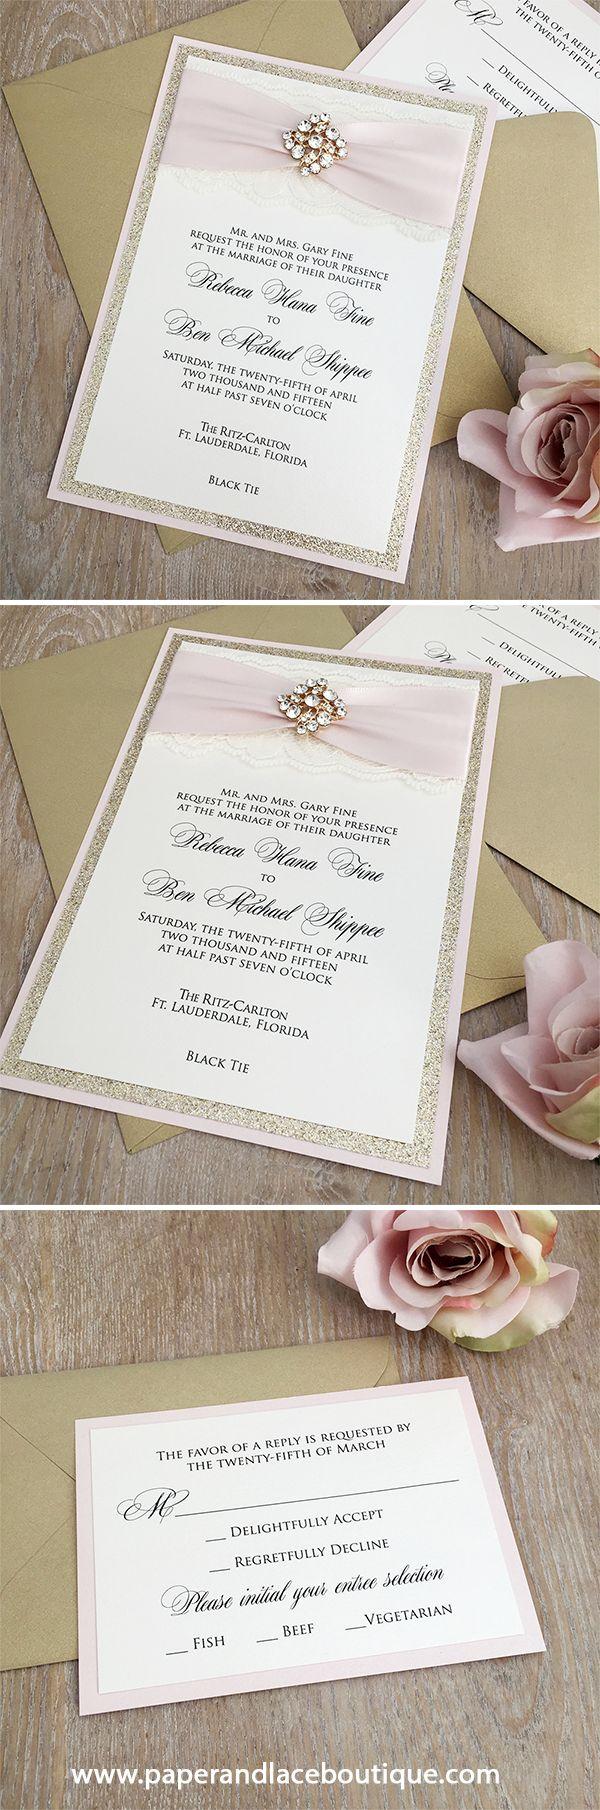 REBECCA - Blush Pink and Gold Glitter Wedding Invitation - Ivory ...